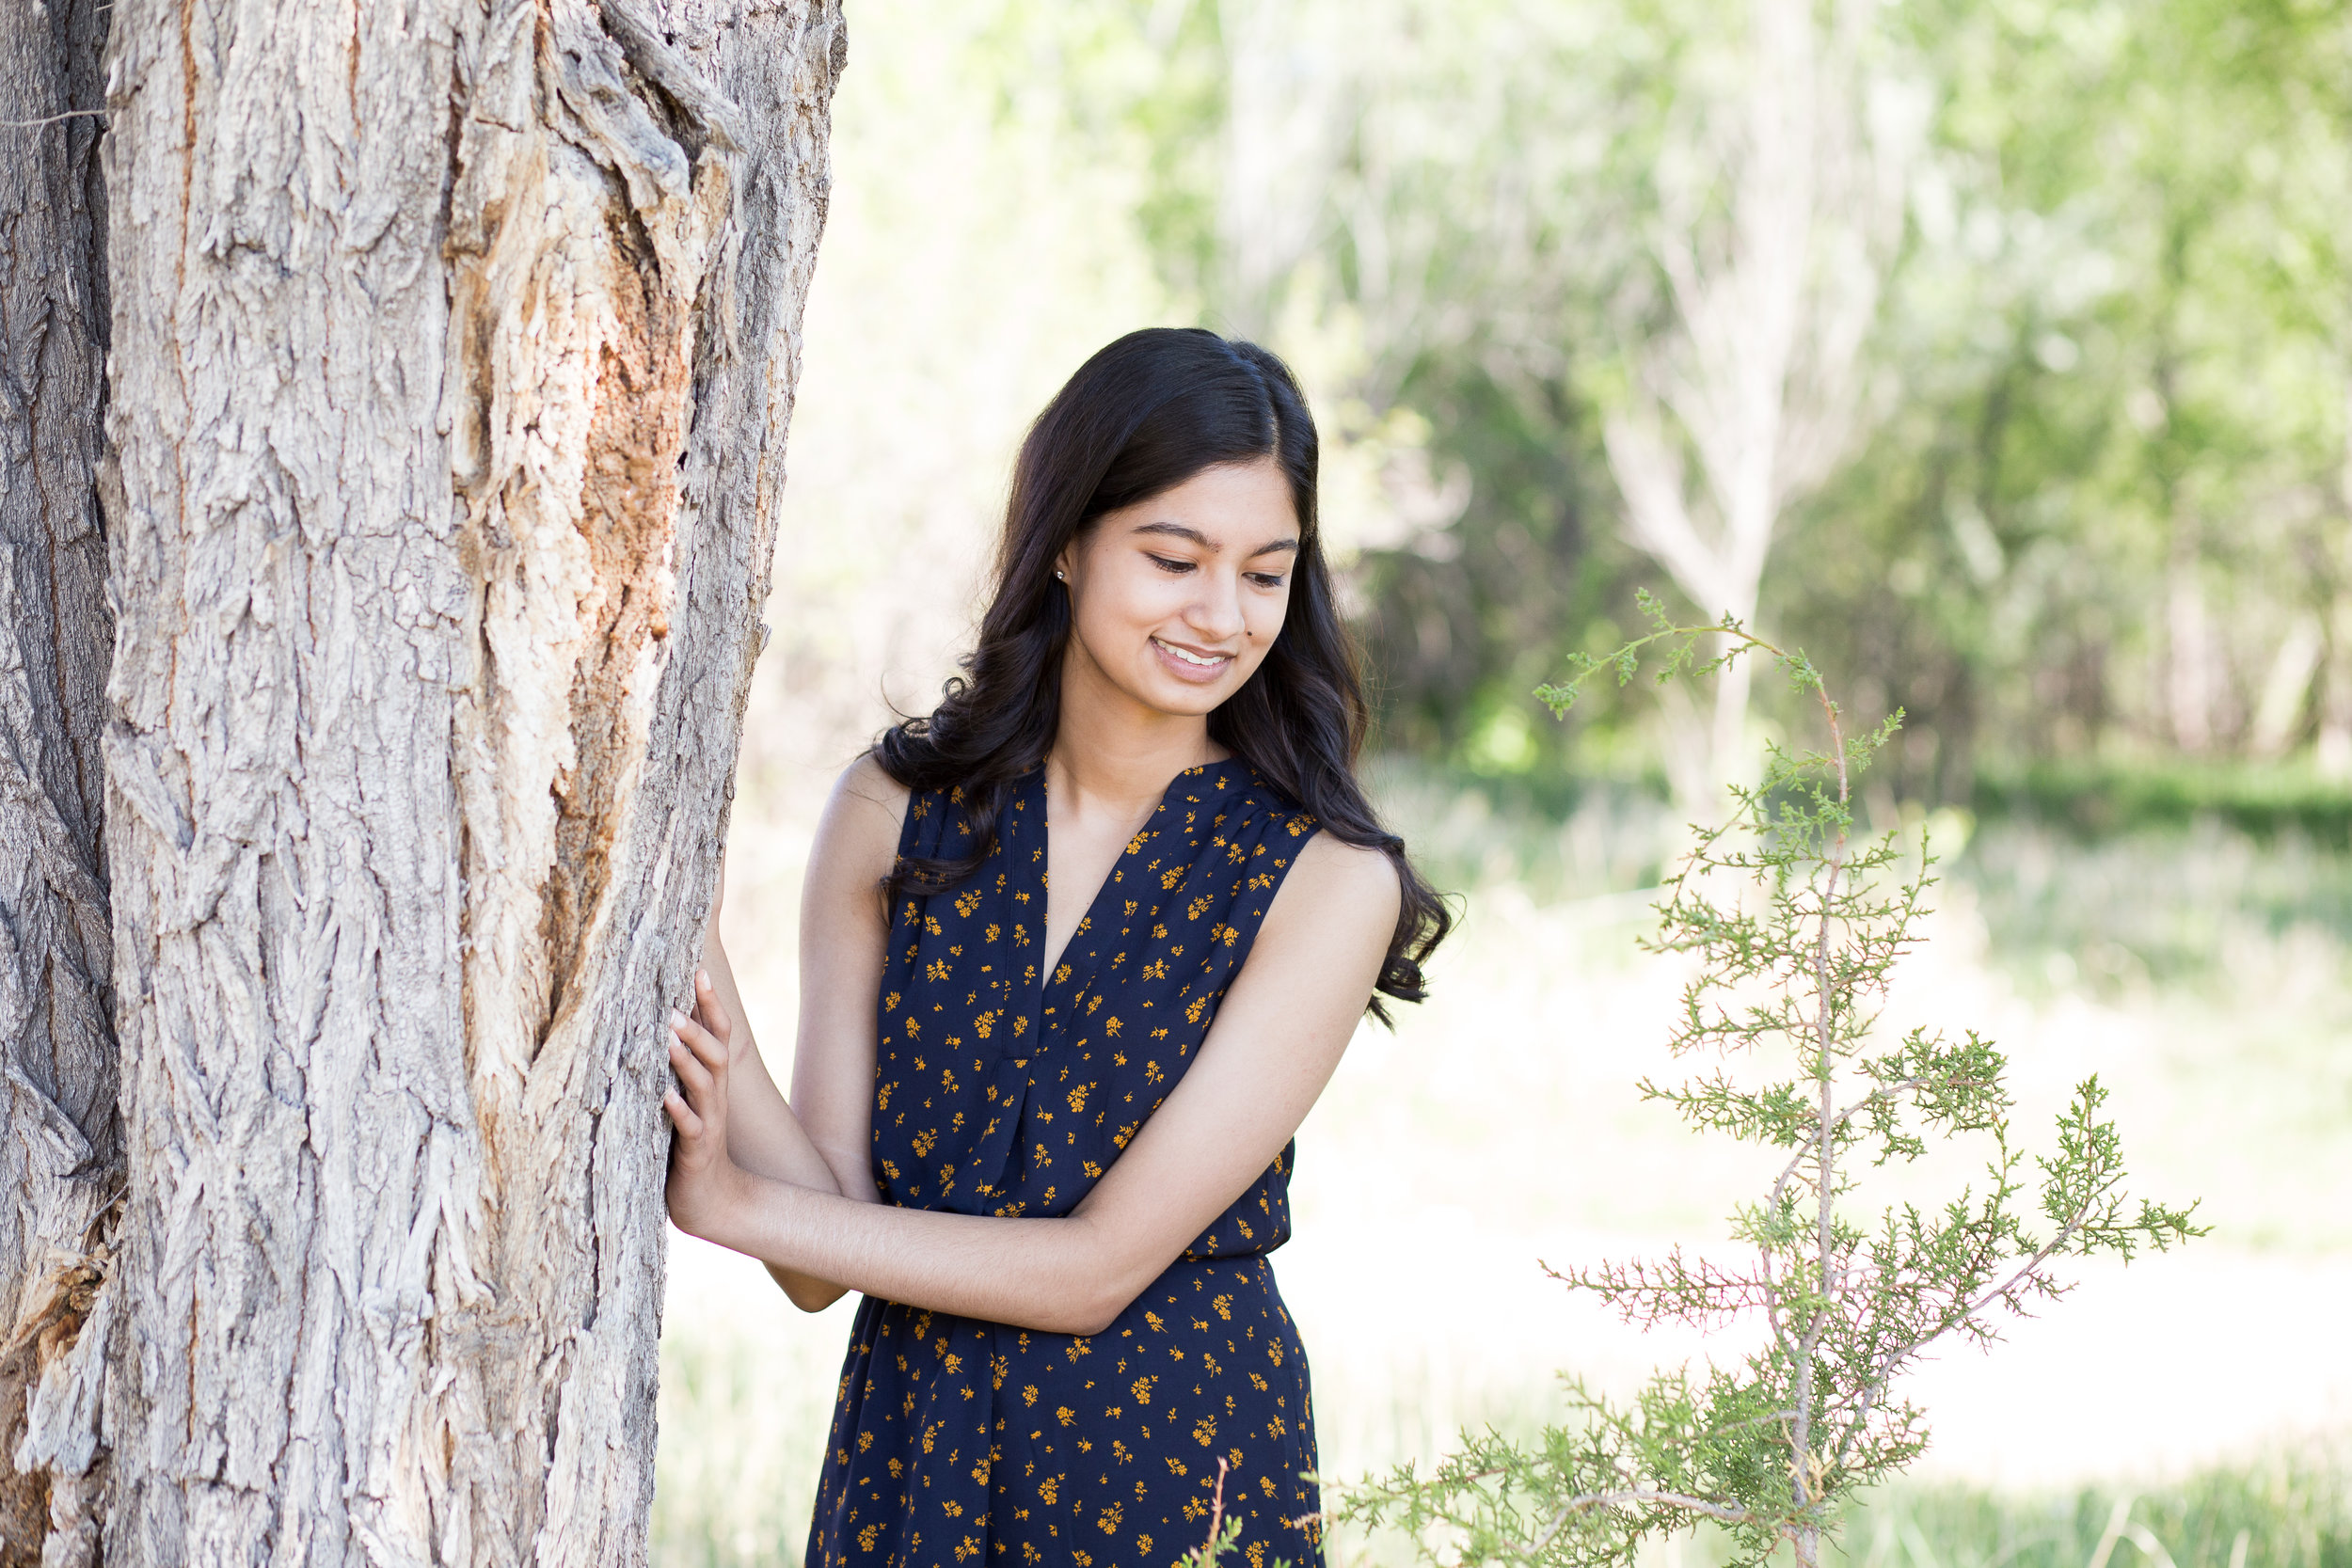 Stacy Carosa Photography - Senior Packages - Colorado Springs Senior Photography - Colorado Springs Natural Light Senior Photographer